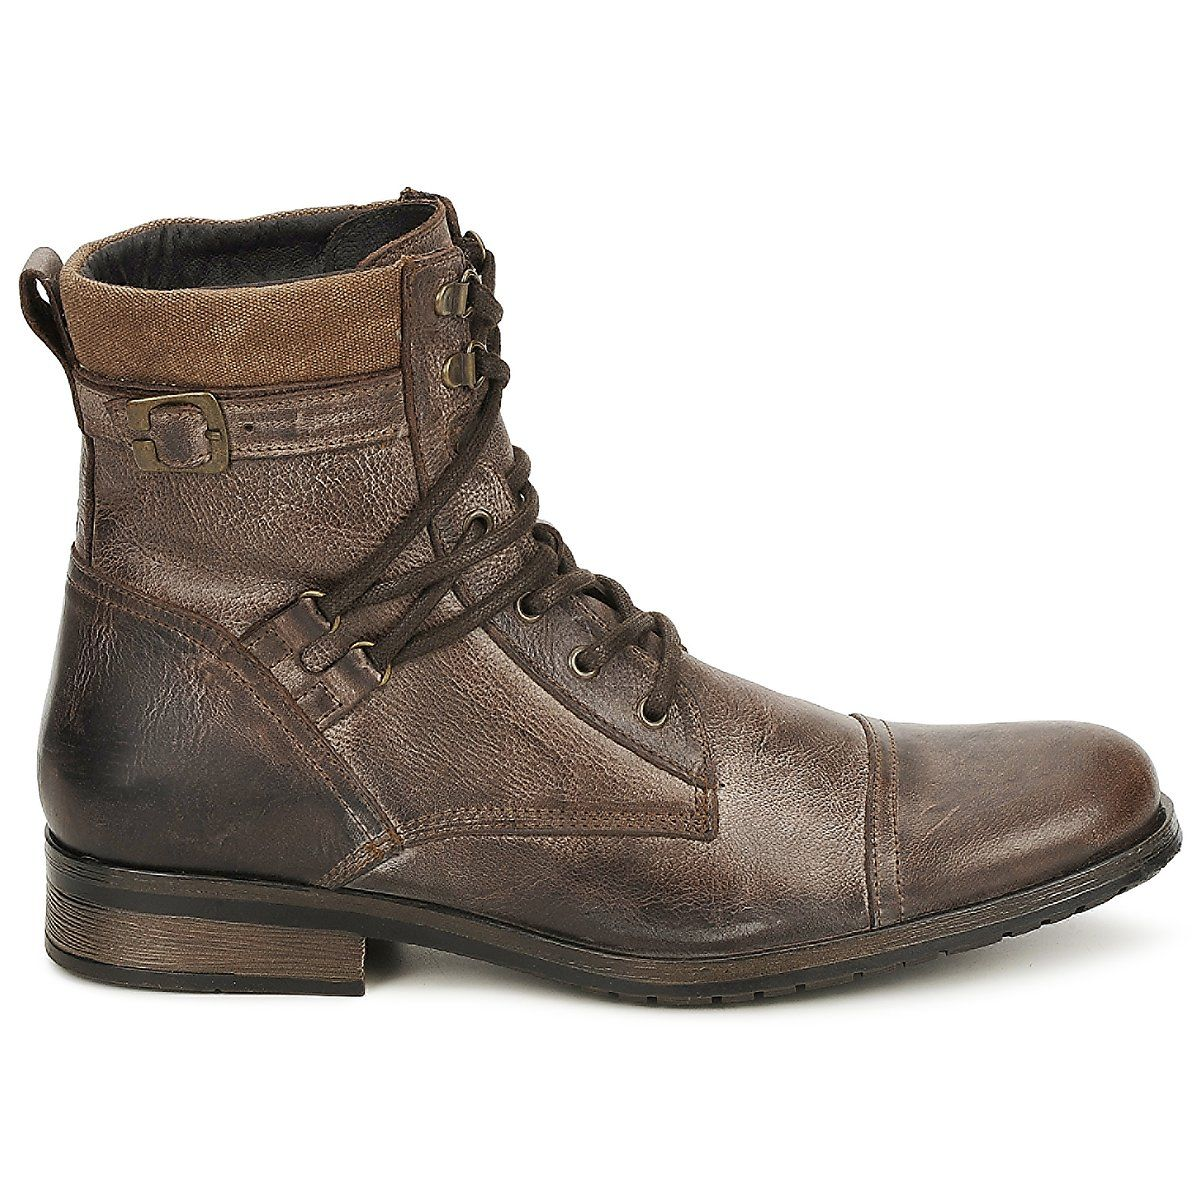 Boots Casual Attitude RIVIGH Marron - Chaussure pas cher avec Shoes.fr ! - Chaussures Homme 89,99 €